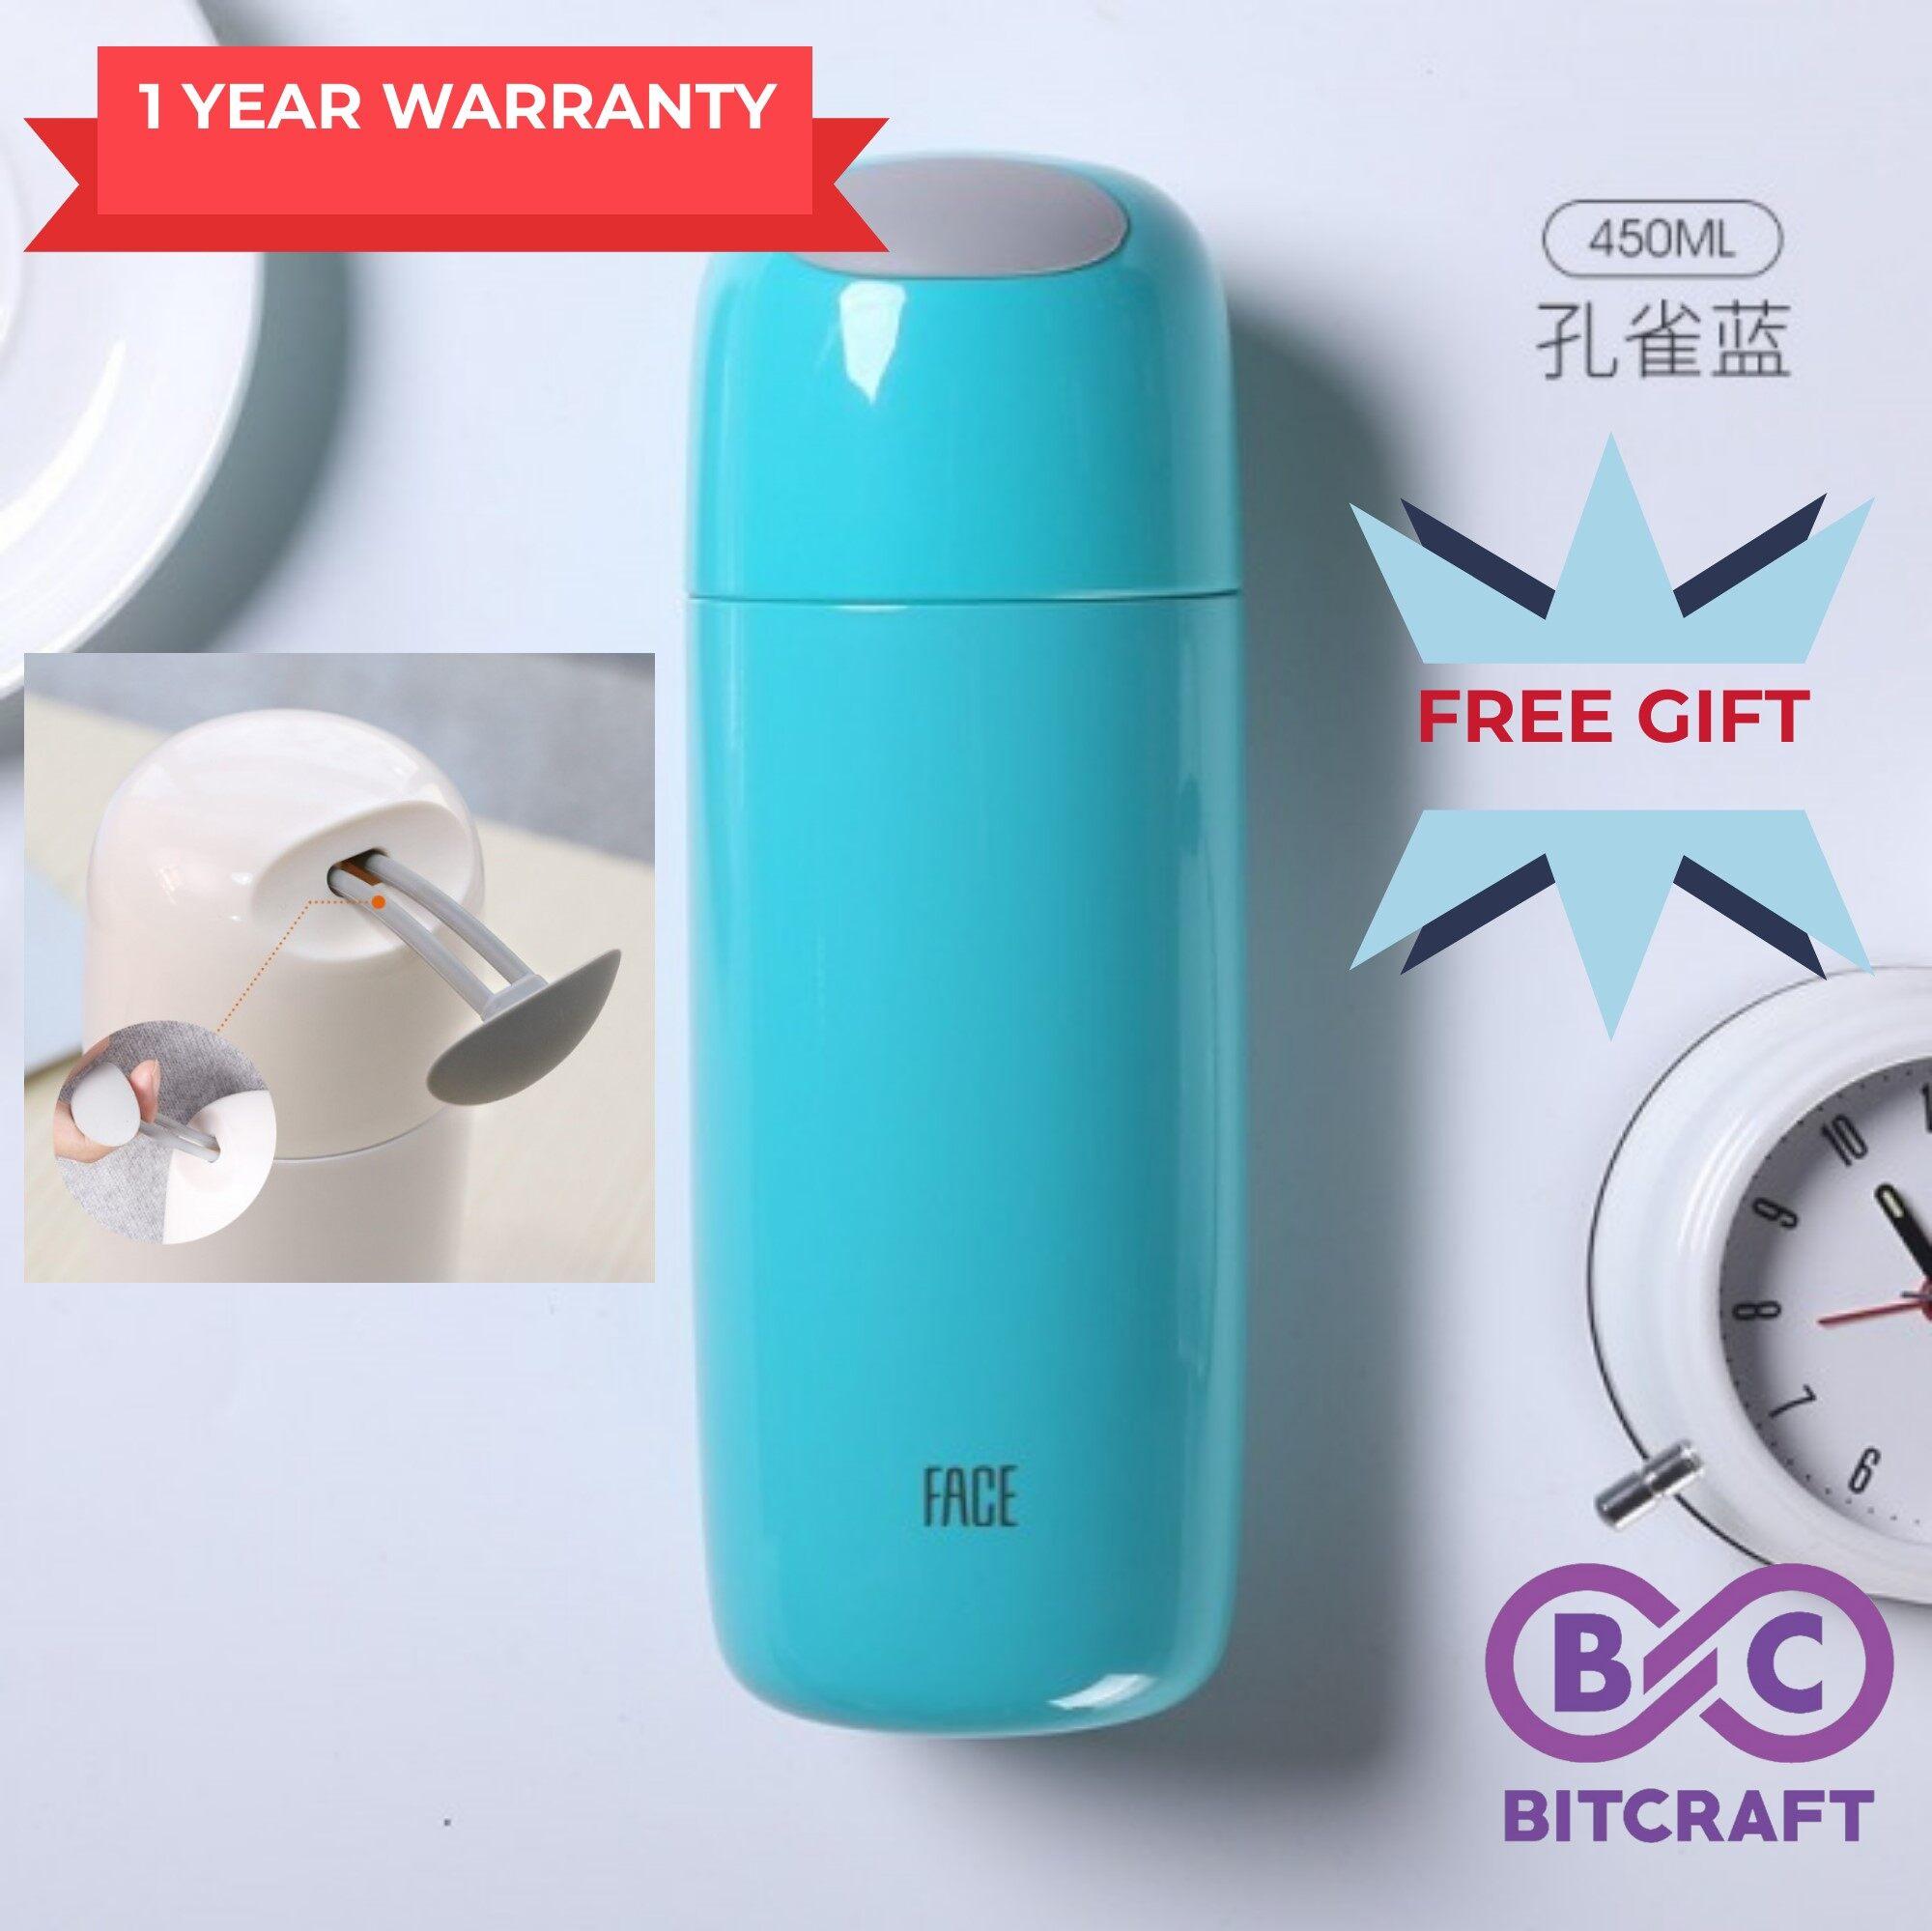 Original FACE Thermos Flask 450mL Korean Style Portable Thermal Vacuum Flask Thermos Bottle Thermos Tumbler Water Bottle FREE GIFT Bitcraft